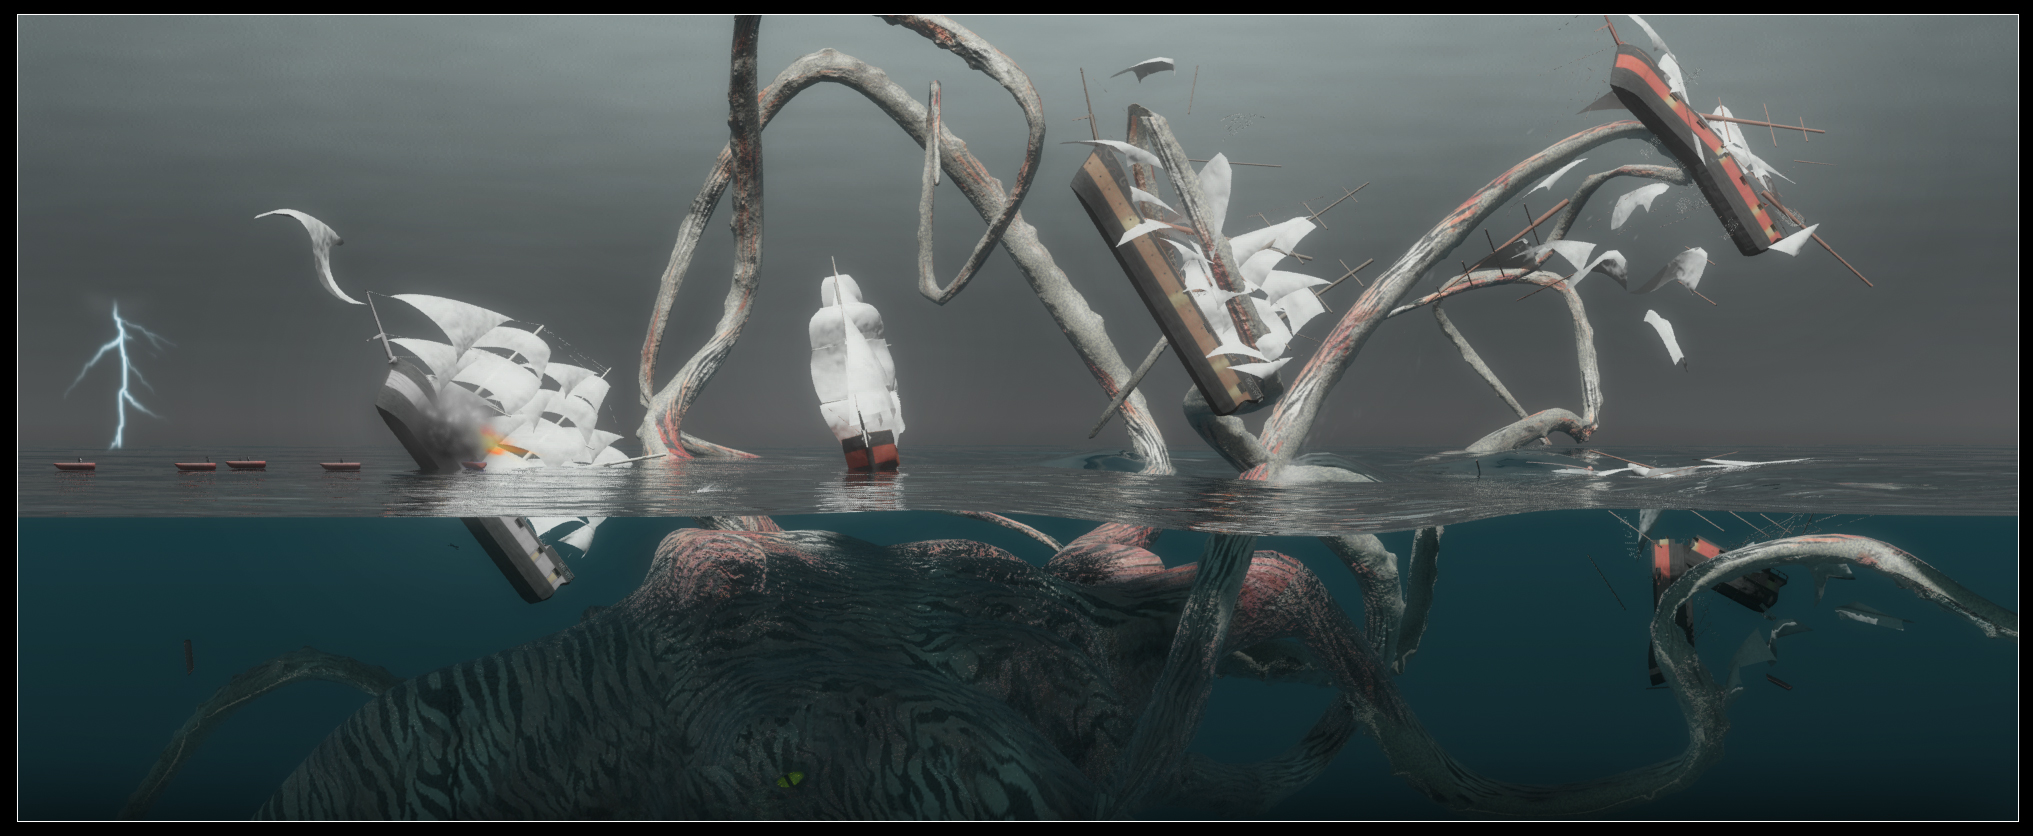 Kraken's Justice by IsaacG